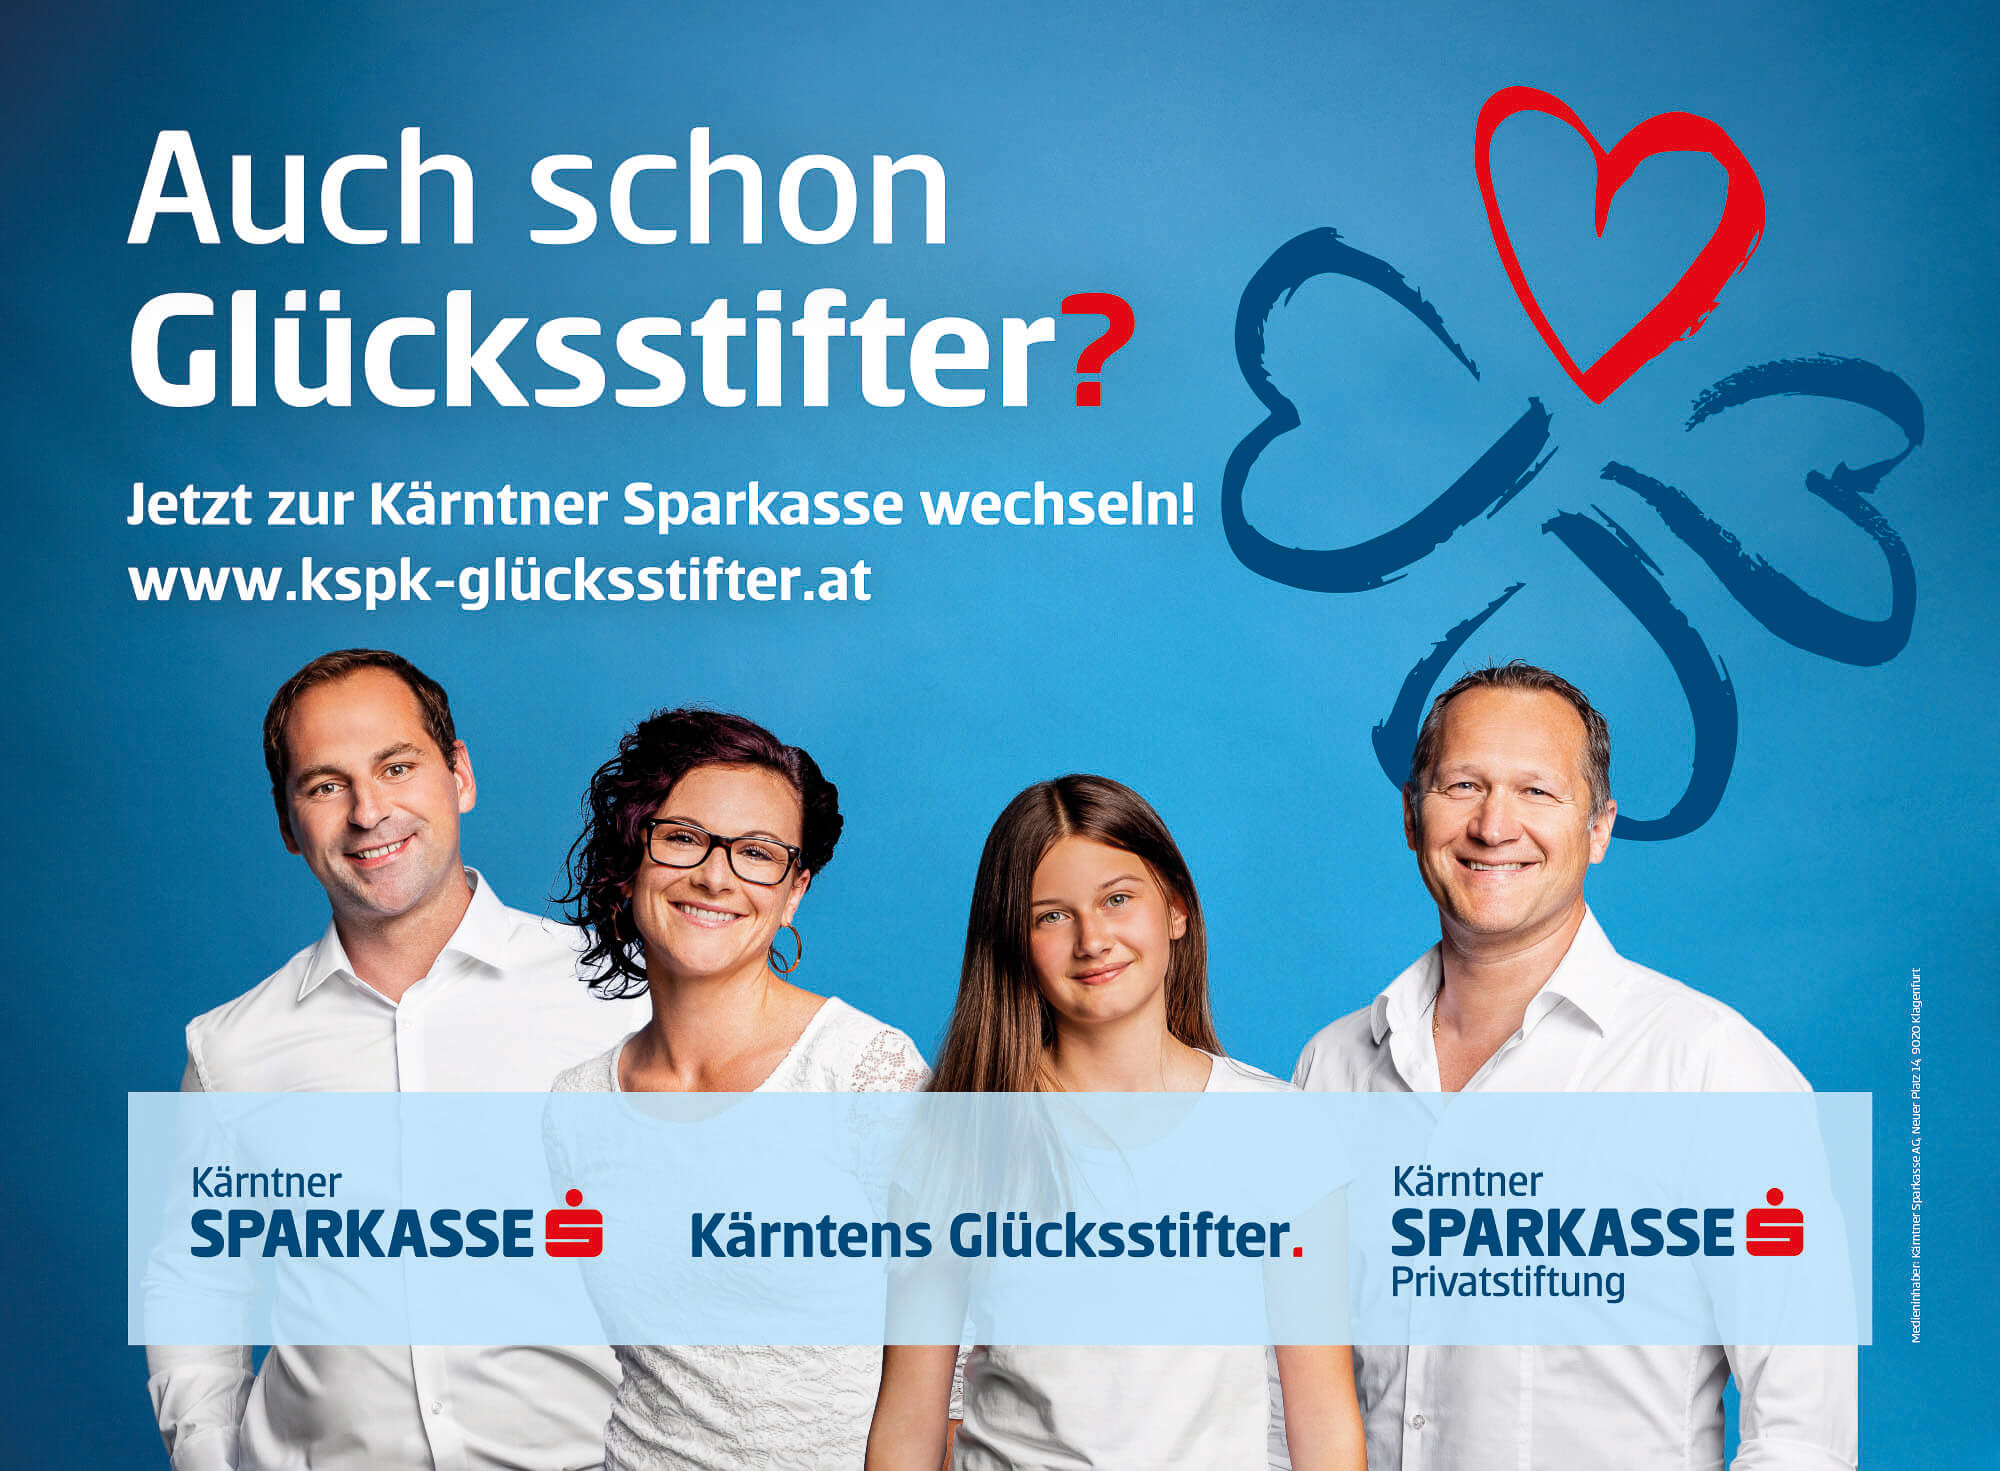 Sparkasse_Glücksstifter_Kampagne_Kärnten_Klagenfurt_BigBang_Daniel_Waschnig_Fotostudio